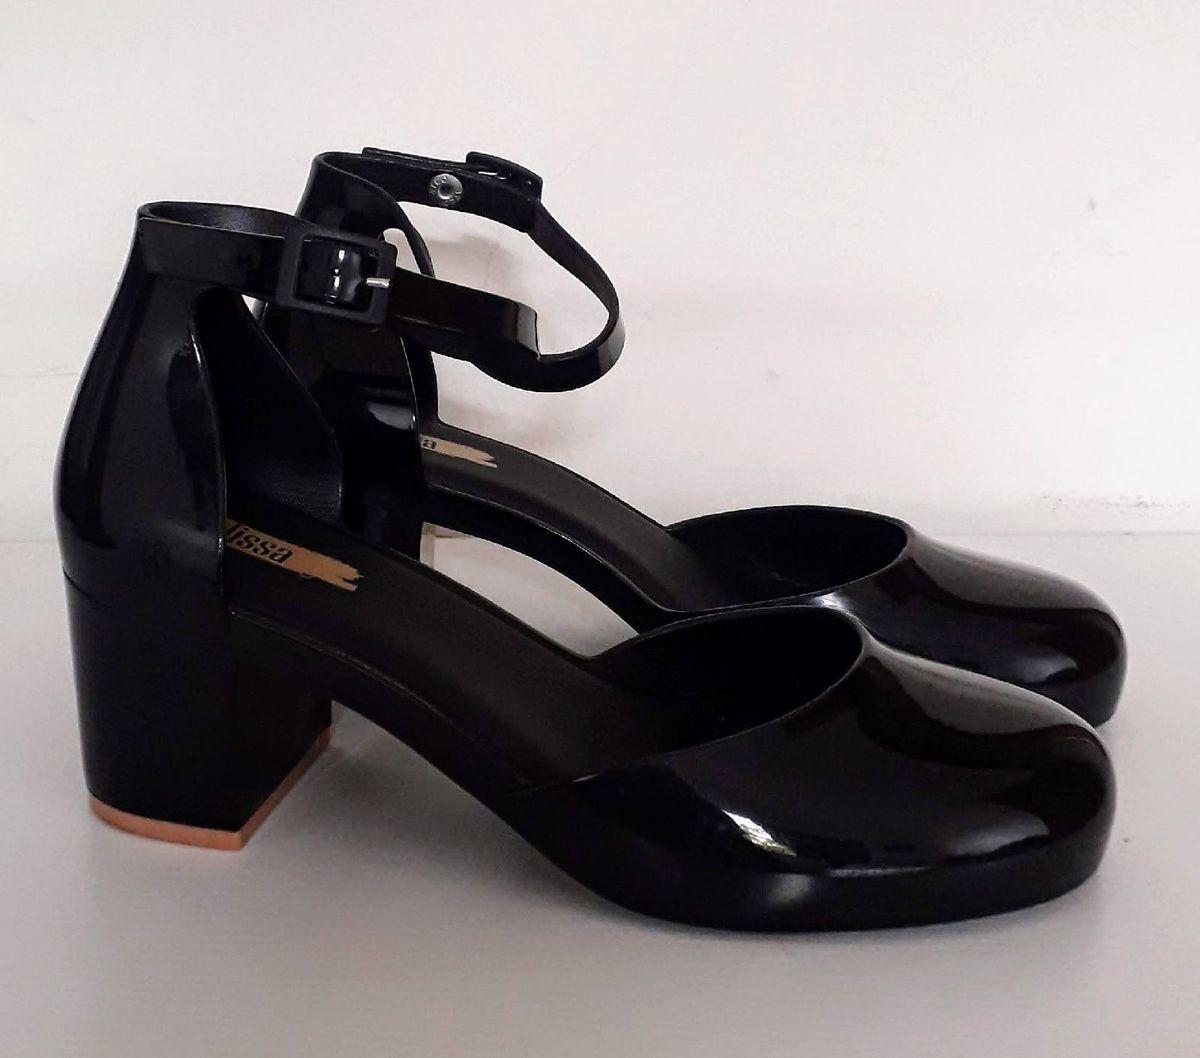 9f4c3af720 melissa femme high - sapatos melissa.  Czm6ly9wag90b3muzw5qb2vplmnvbs5ici9wcm9kdwn0cy81mtq5odg1l2iynji0nmezn2e2mmzhyzjhmtnlnmy0mdm0yzzizwqylmpwzw